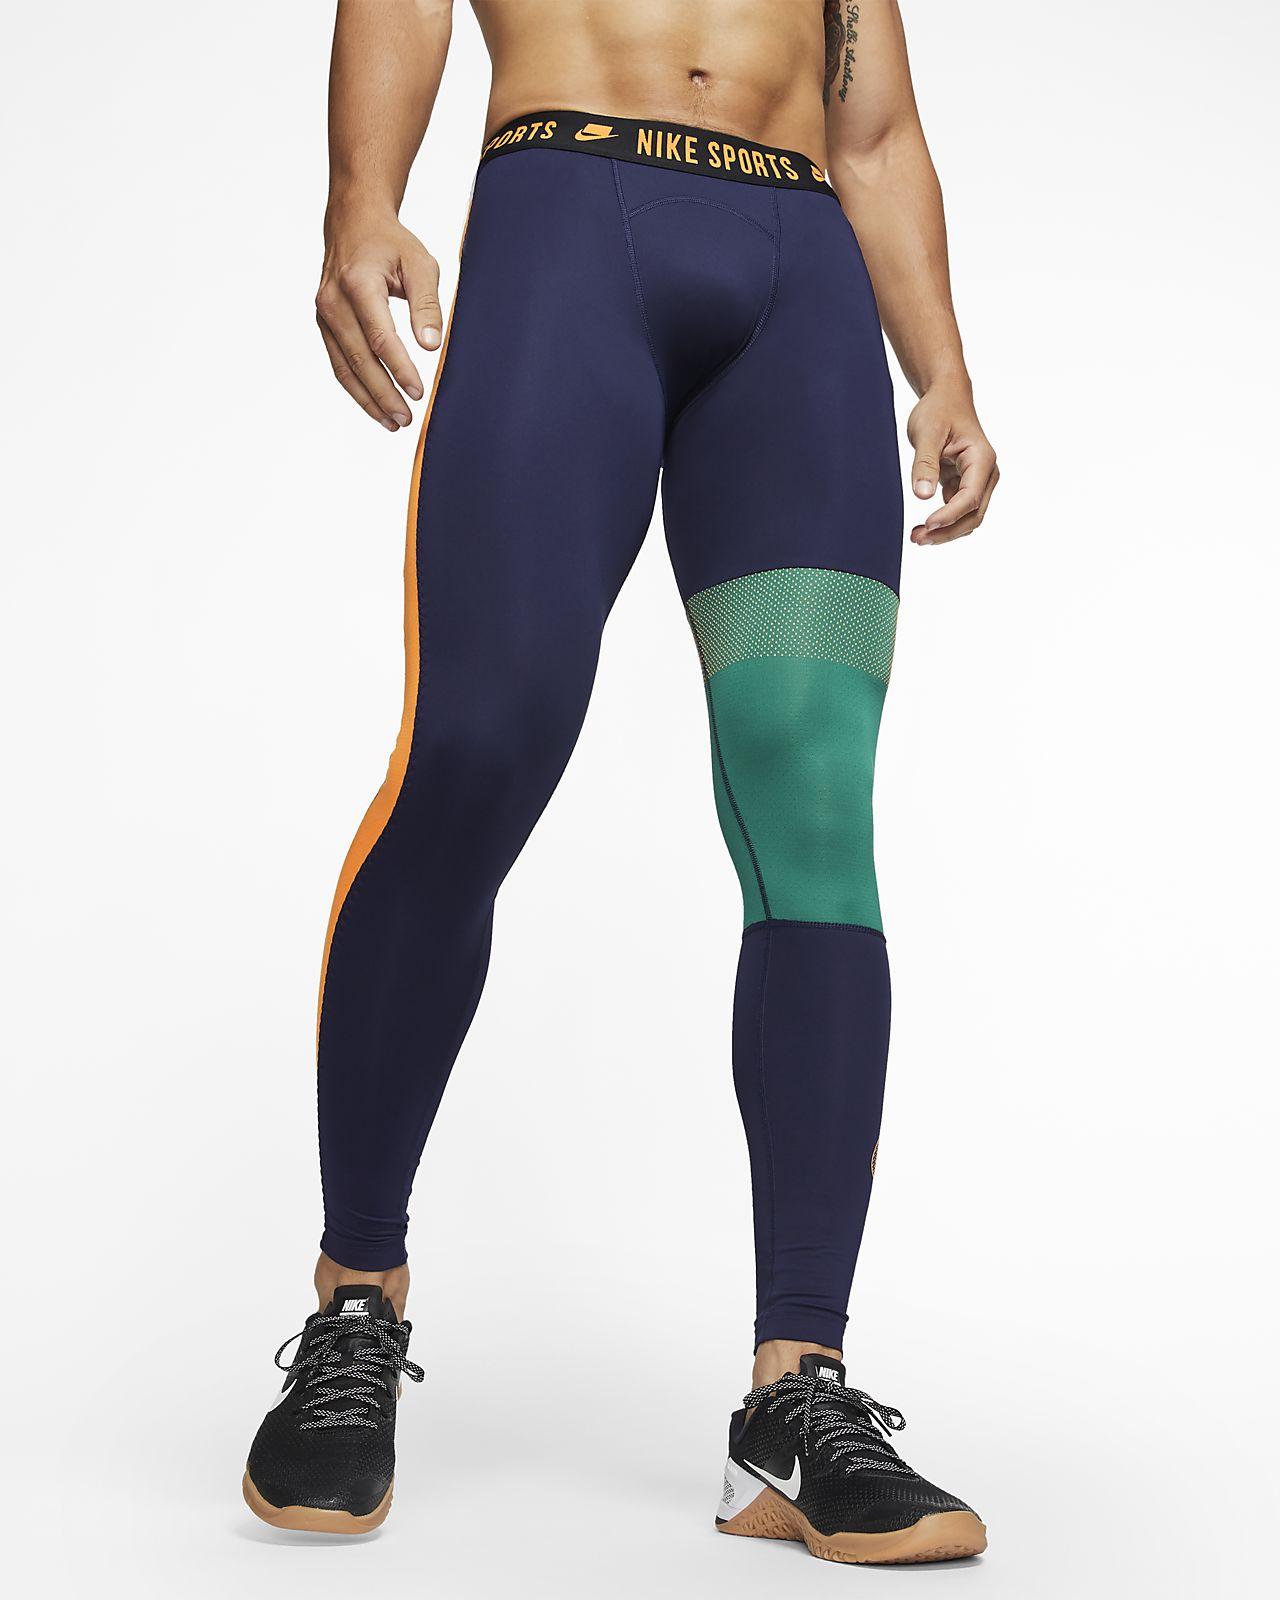 Nike Pro Sport Clash Men's Tights